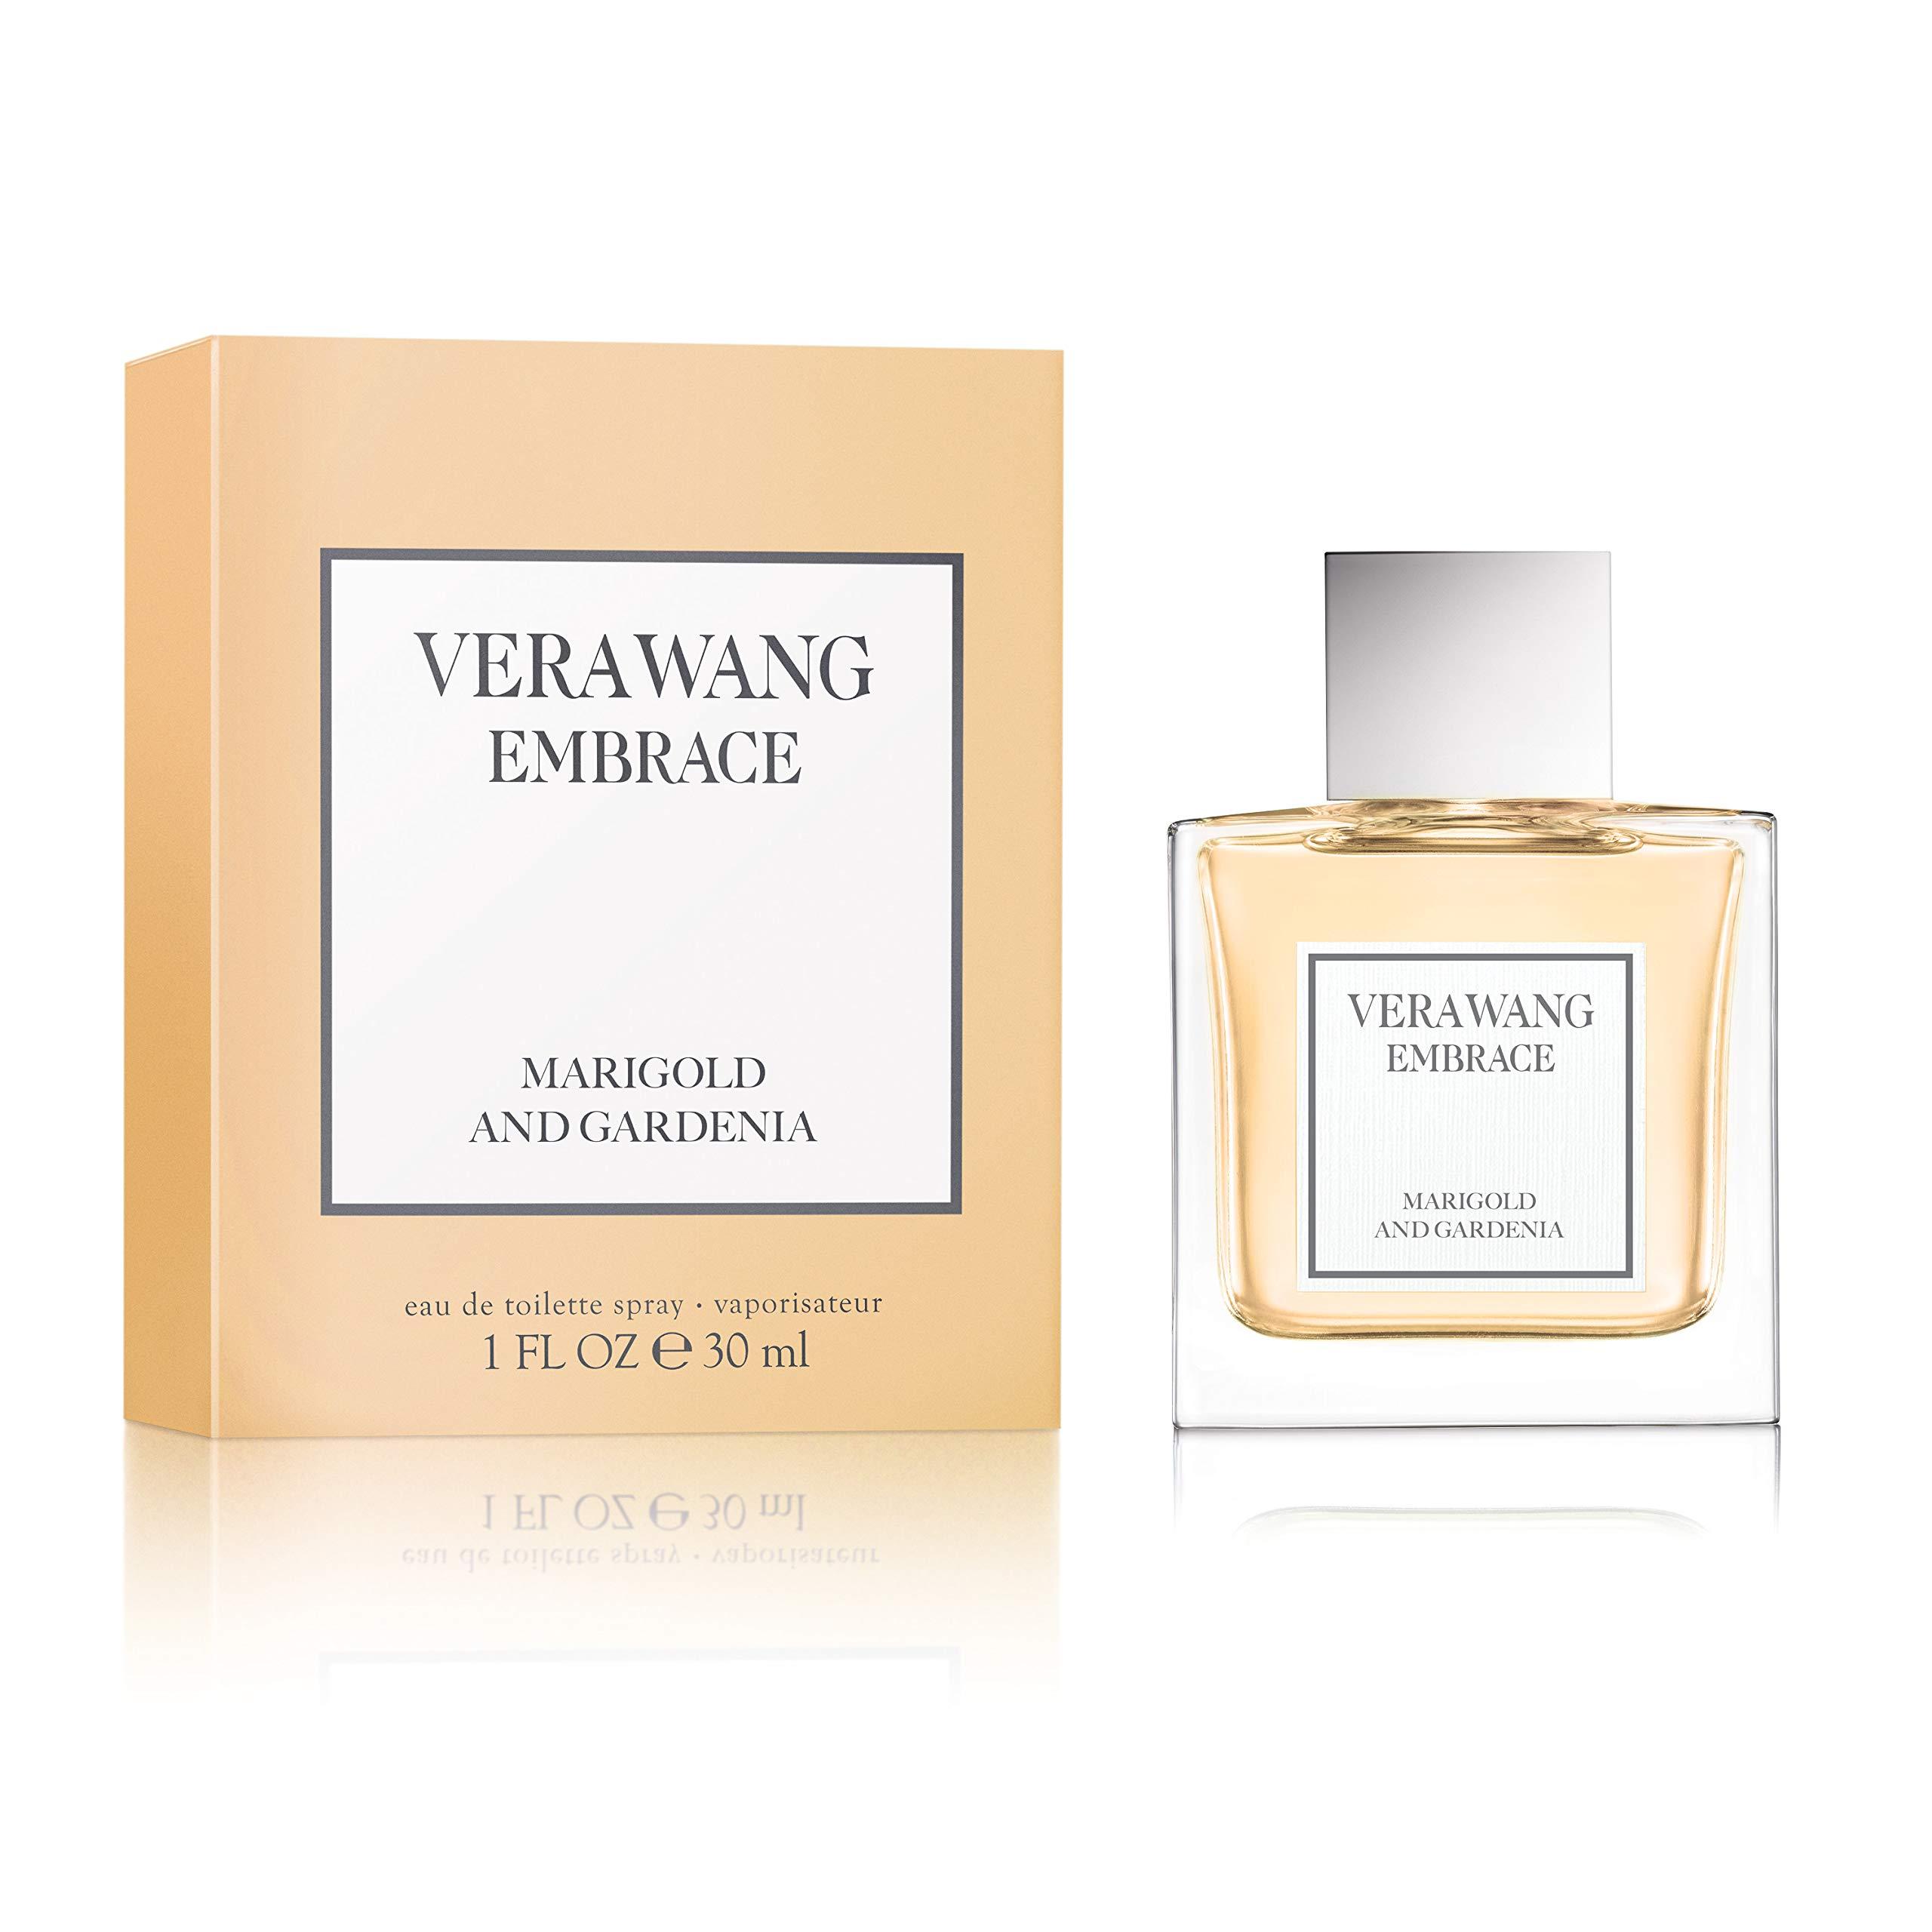 Vera Wang Embrace Eau de Toilette Spray for Women, Marigold and Gardenia, Great Mother's Day Gift, 1 Fluid Ounce